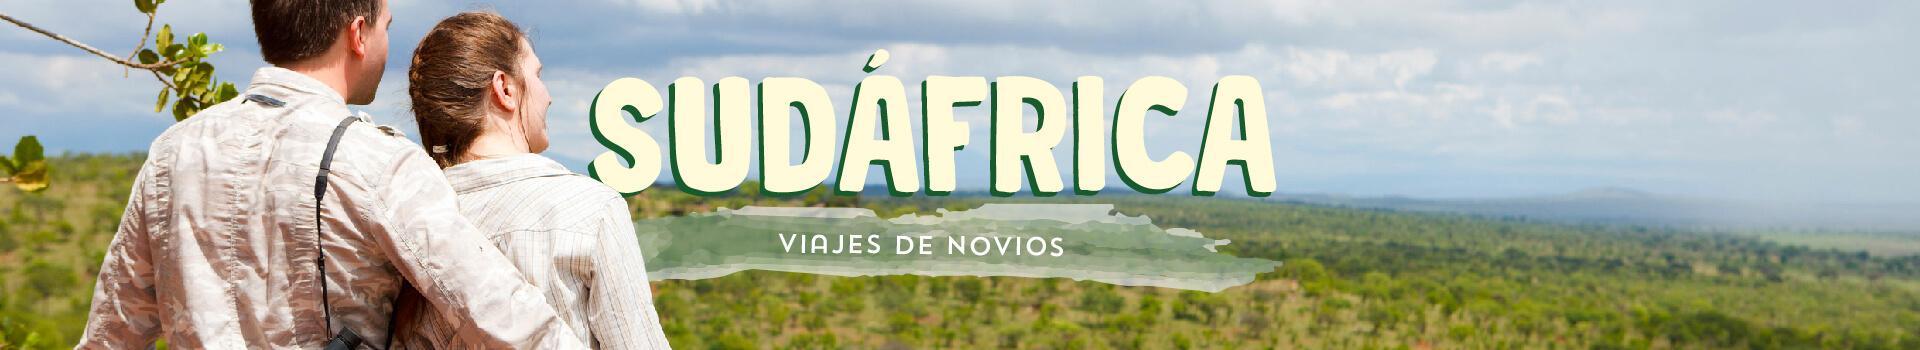 Viajes de Novios Sudafrica